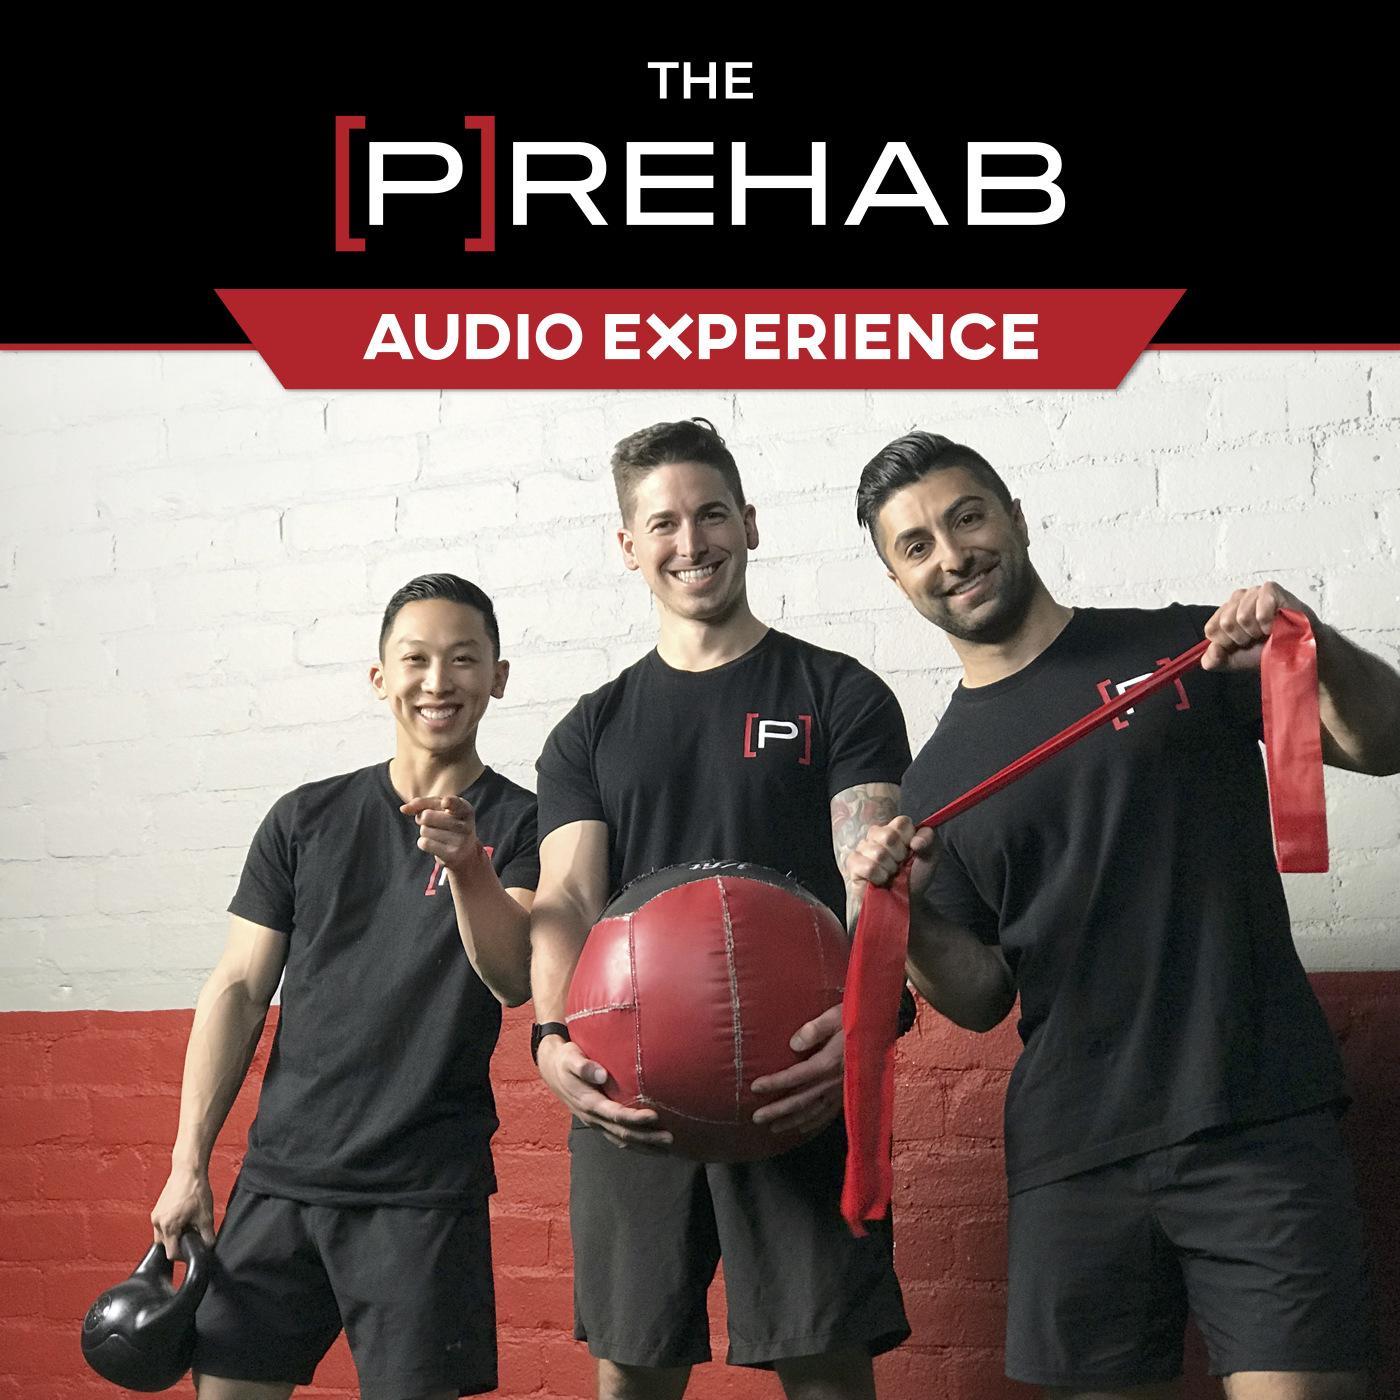 The [P]Rehab Audio Experience